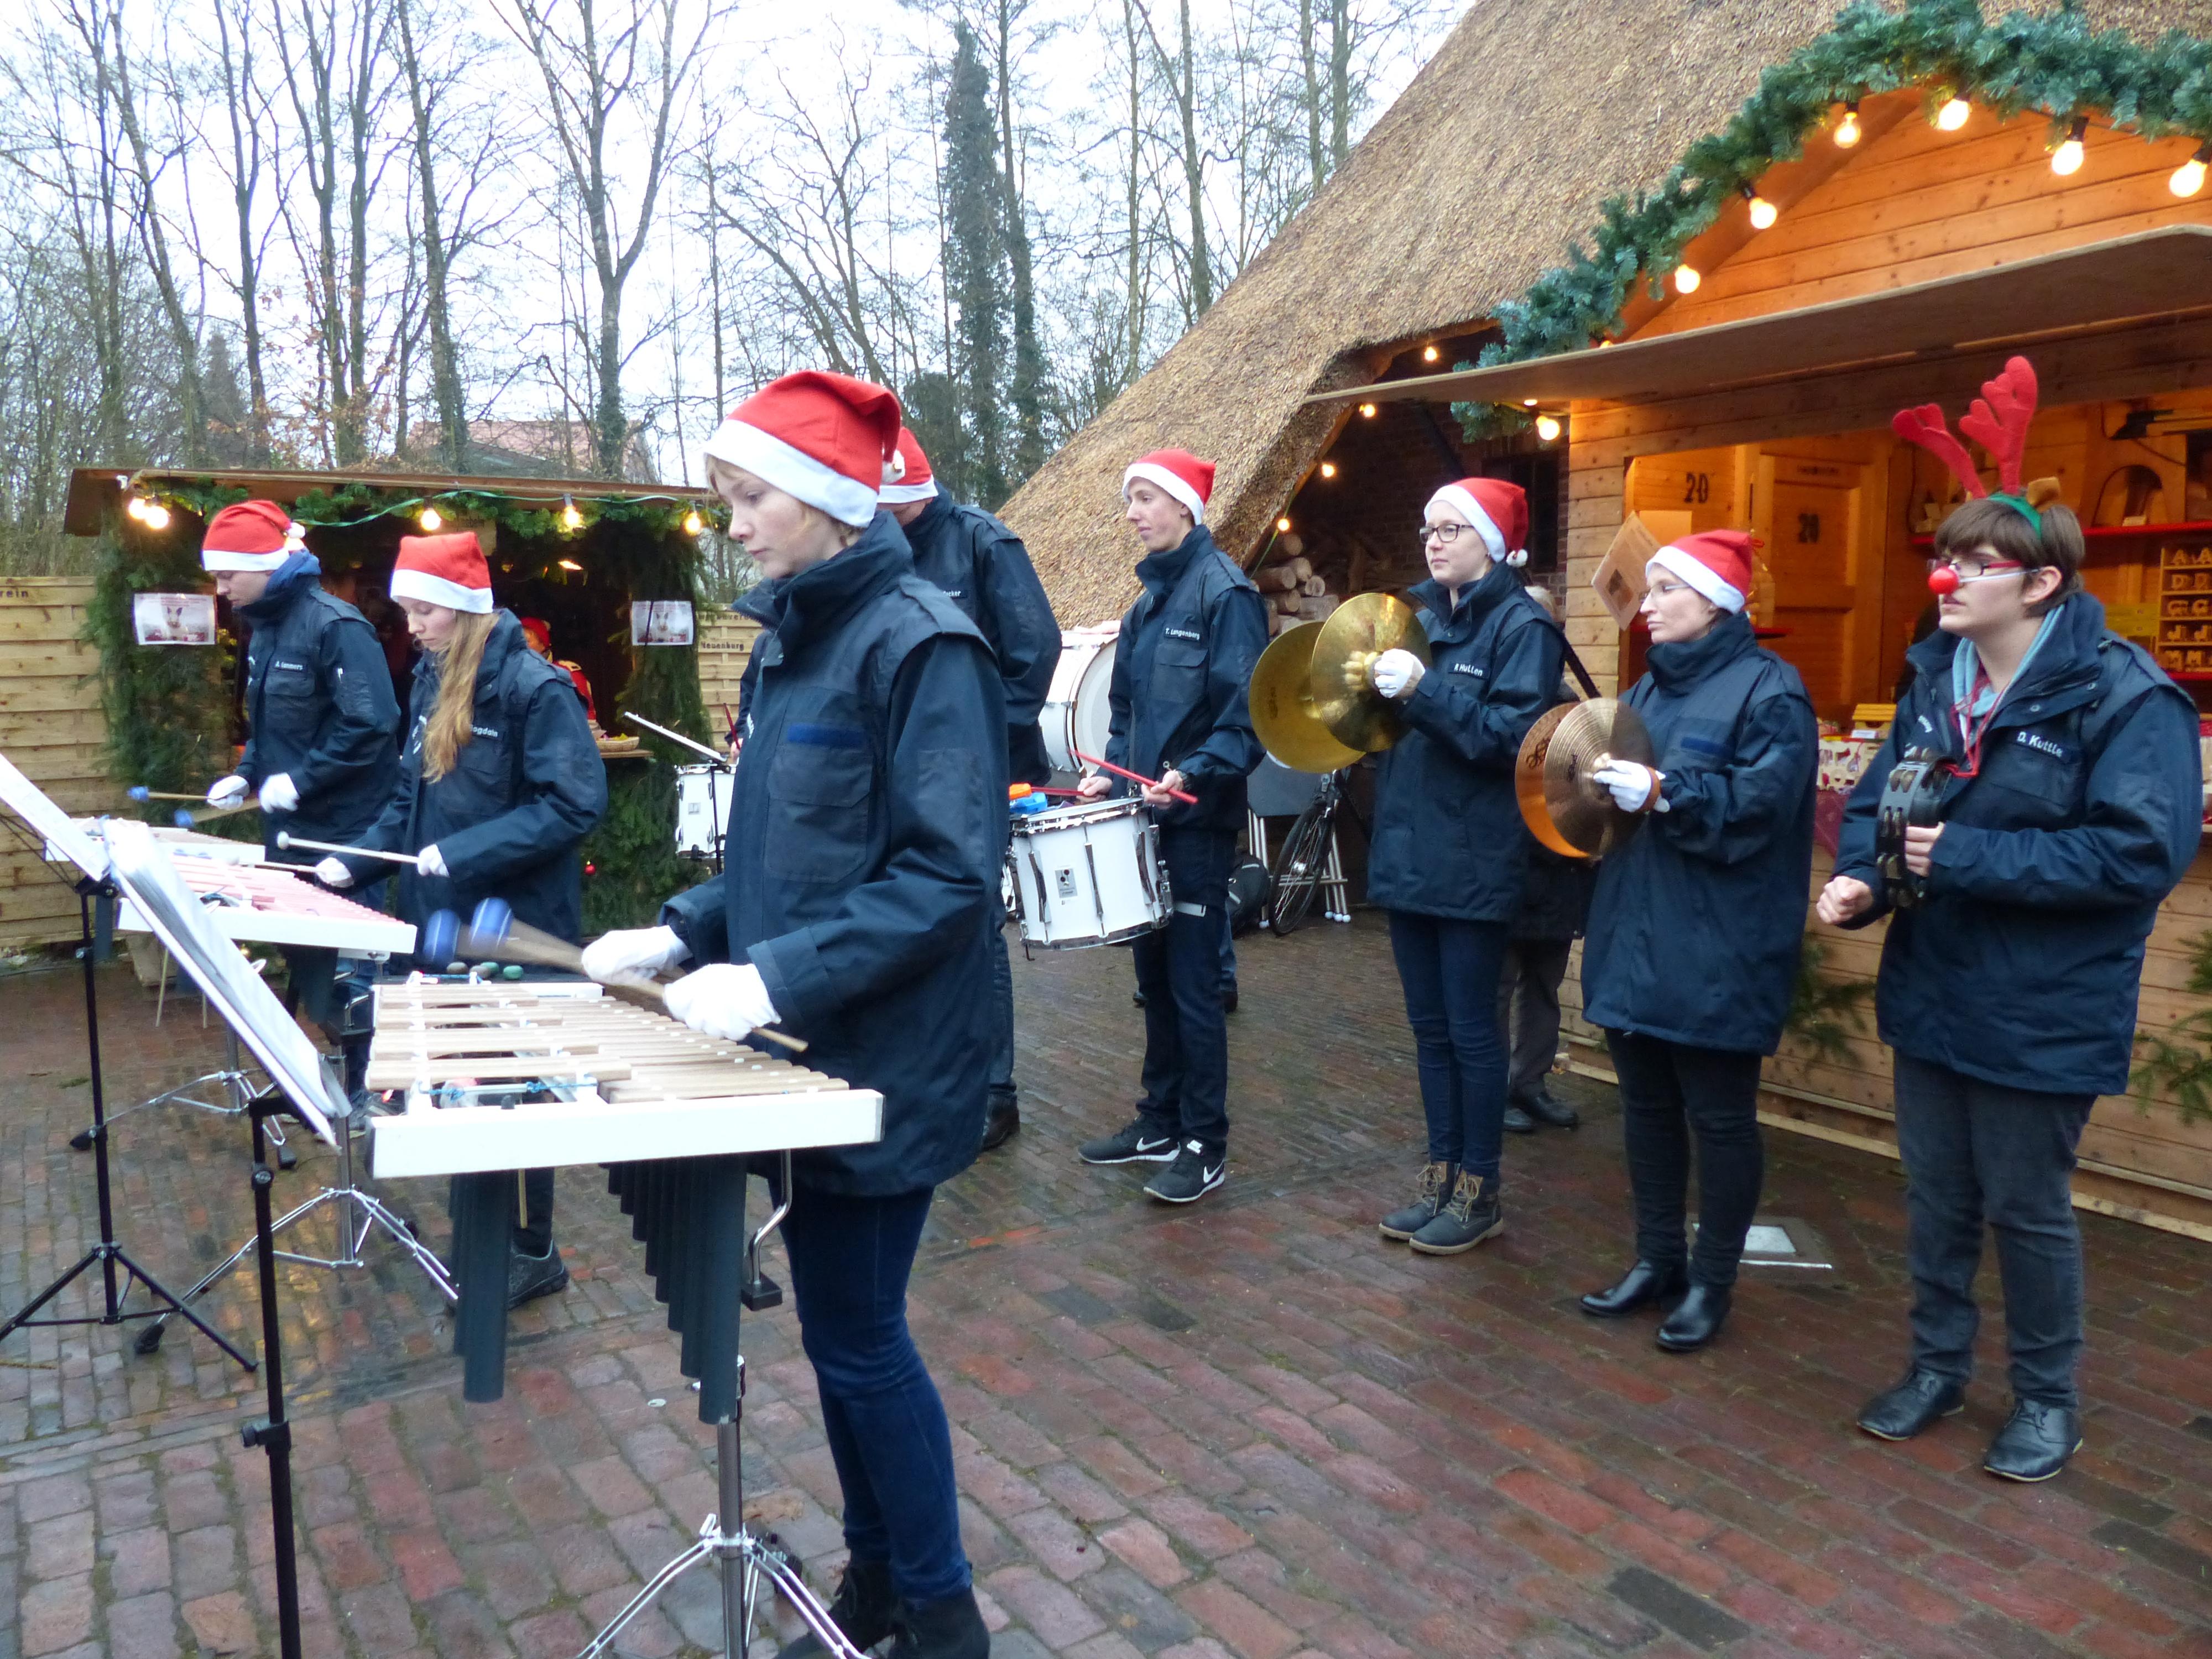 Neeborger Wiehnachtsmarkt 2016